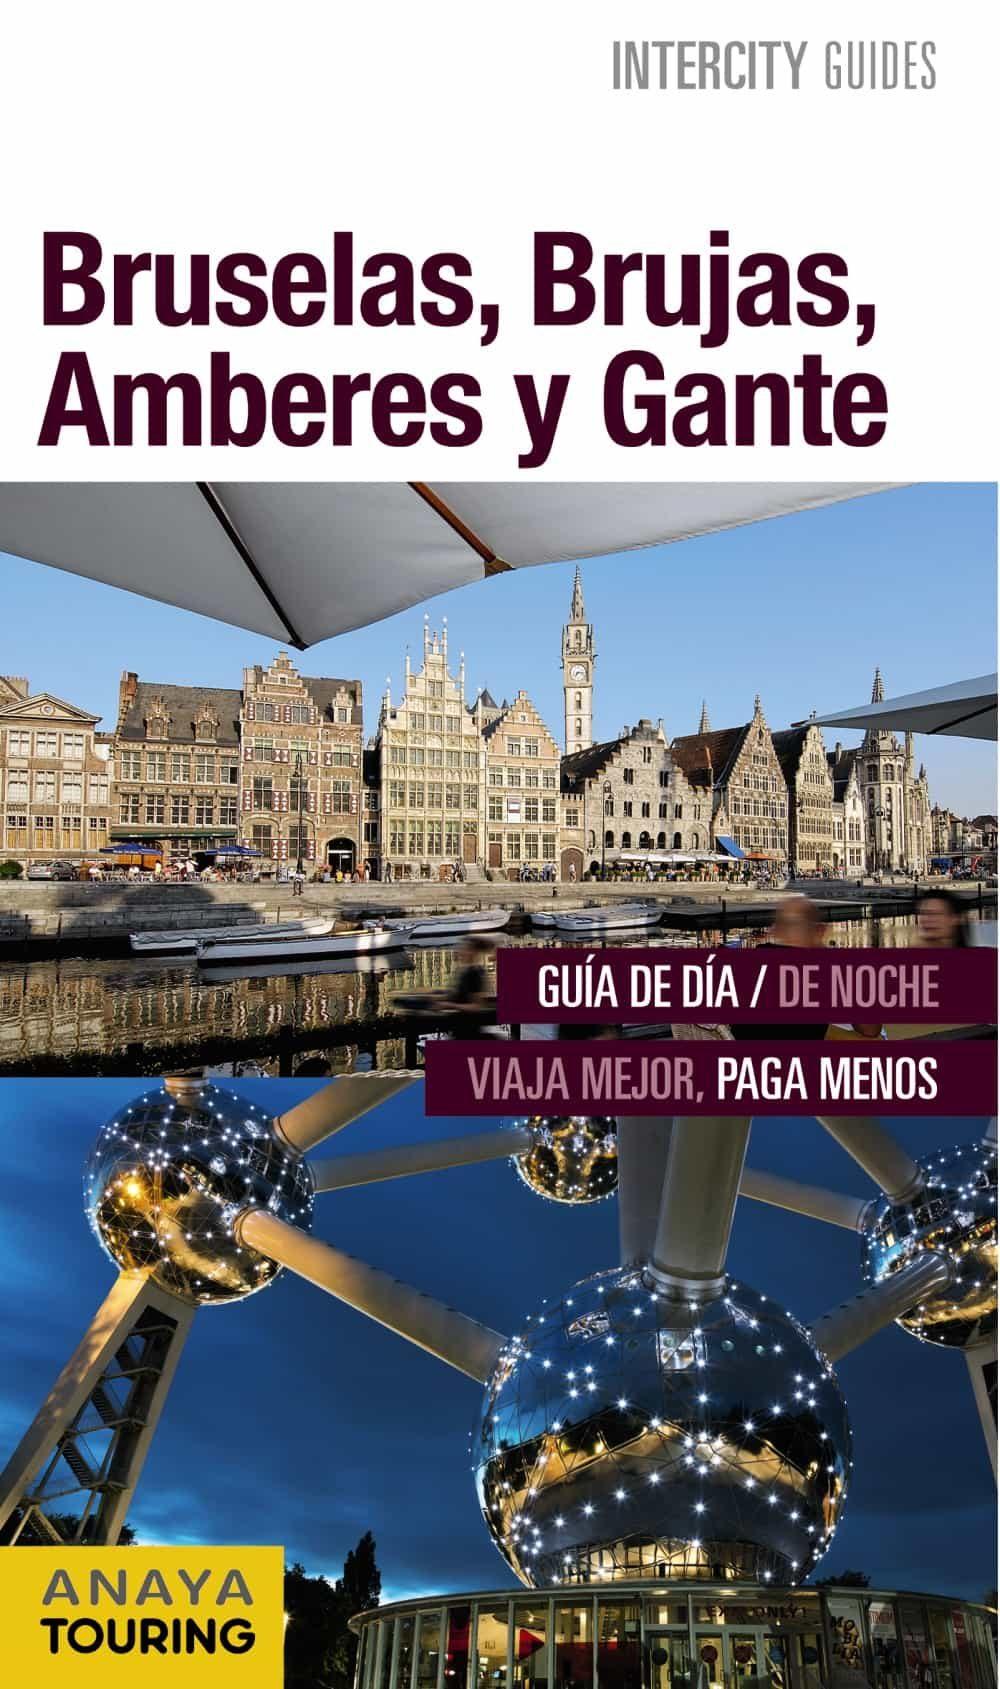 bruselas, brujas, amberes y gante 2016 (intercity guides)-9788499358024